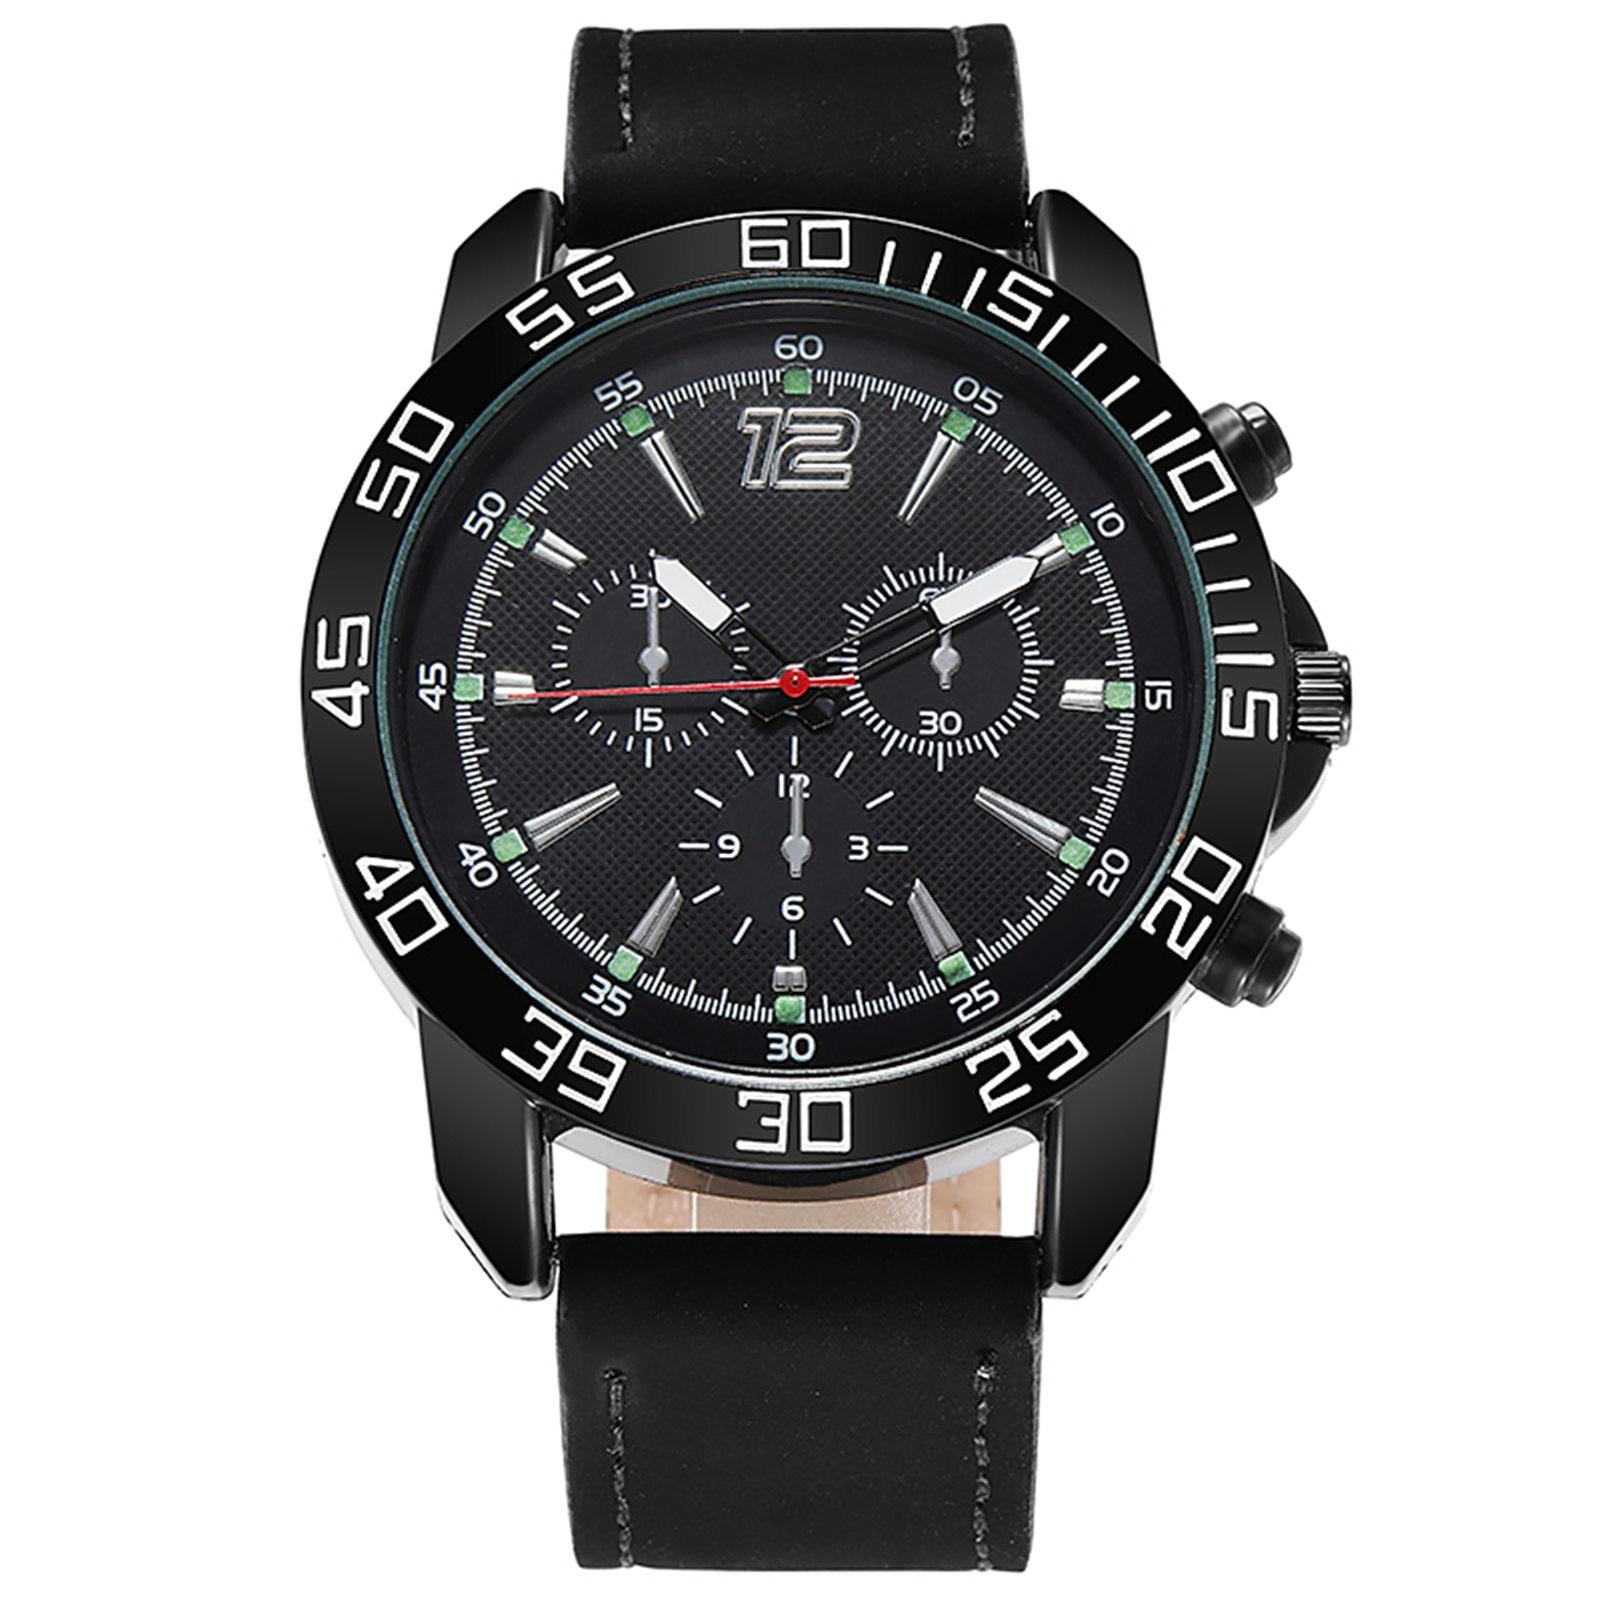 Quartz Watch Bracelet Set Green Dial Simple Luminous Watches,Men's Watches,Men's Outdoor Multi-Funct